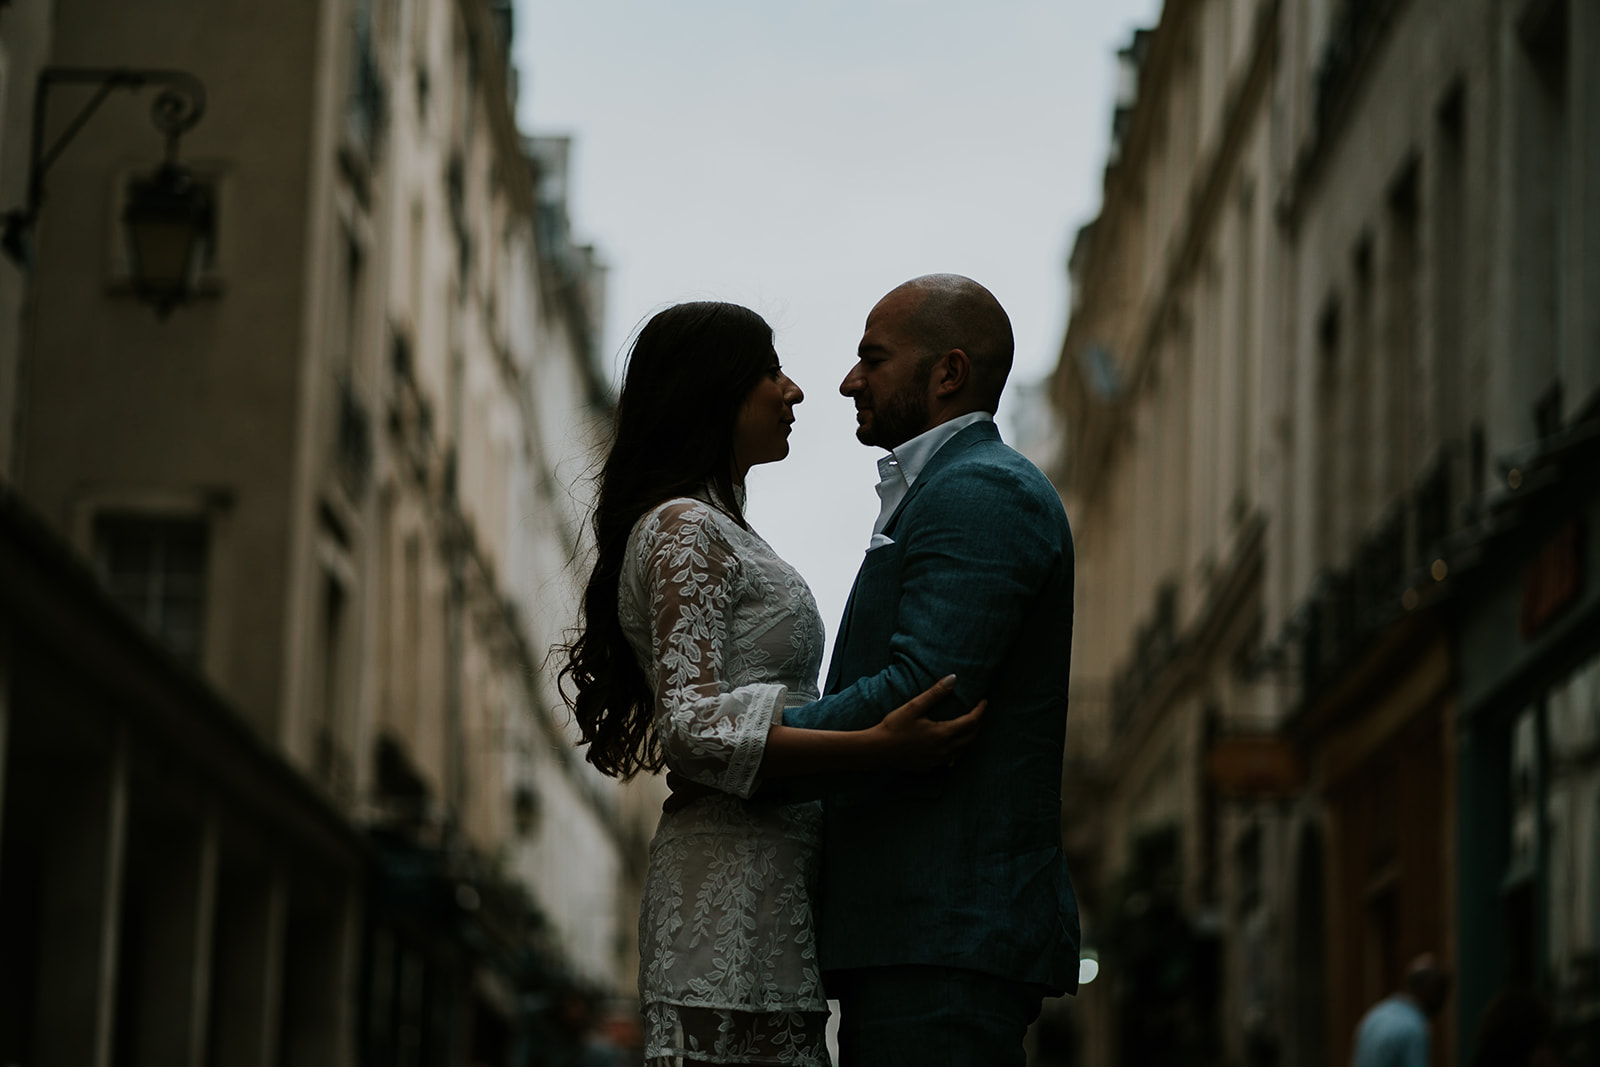 Sabri-photographe-sayde-_-george-wedding-112.jpg